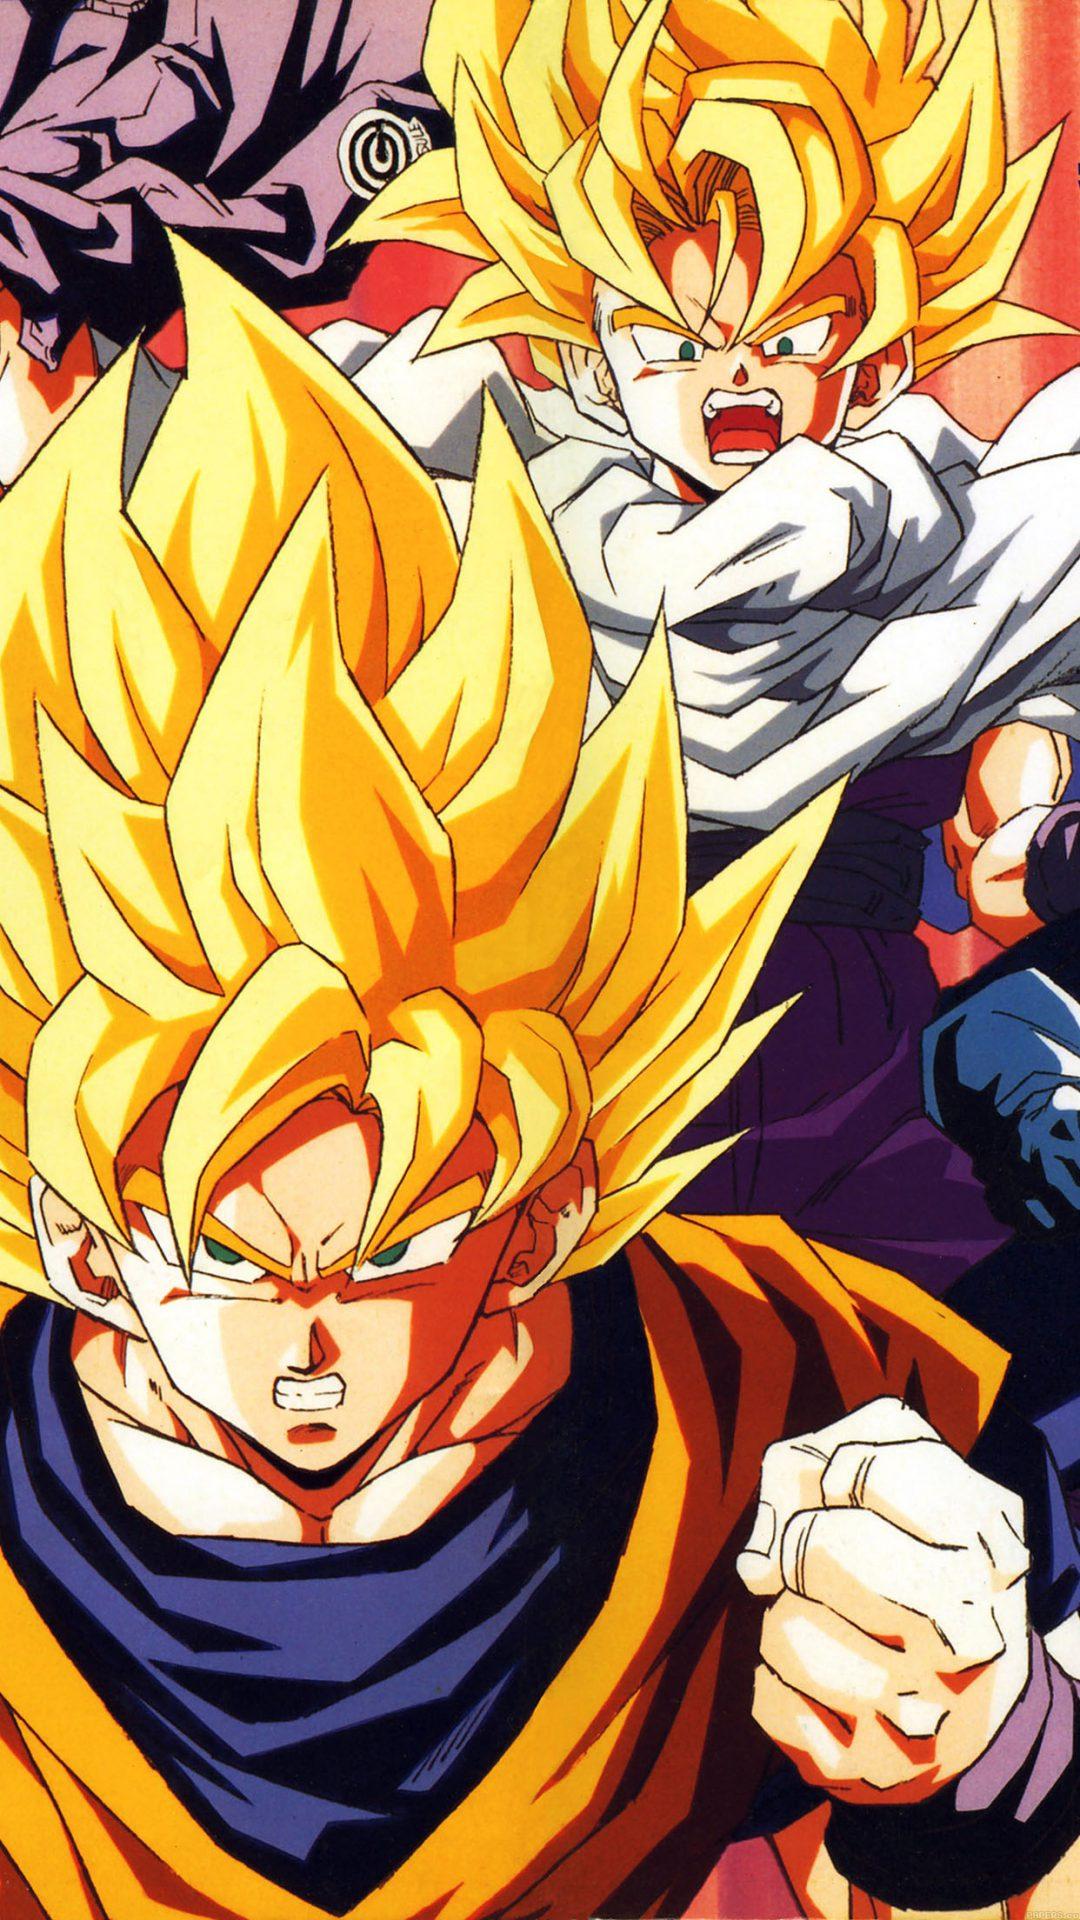 Wallpaper Dragonball Z Goku Fire Anime